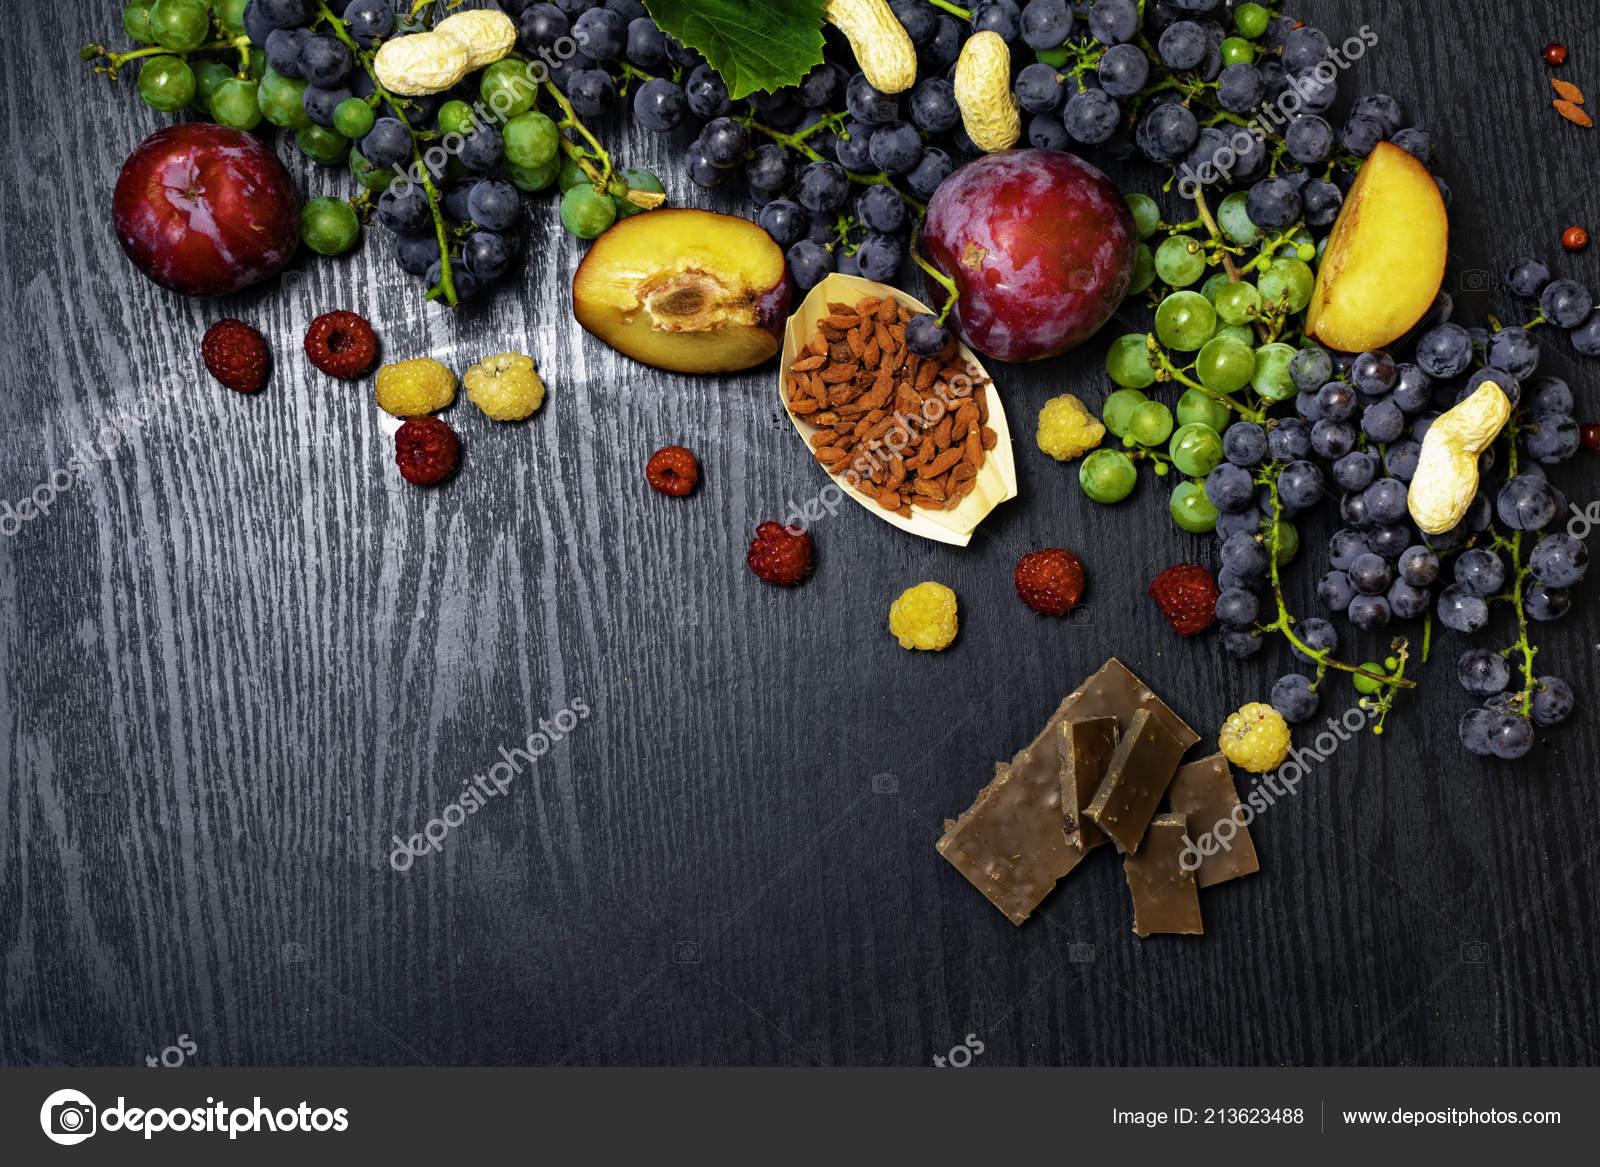 Fruits Health Food Rich Resveratrol Grapes Plums Goji Peanuts Cranberry Stock Photo C Dian4ikn Gmail Com 213623488